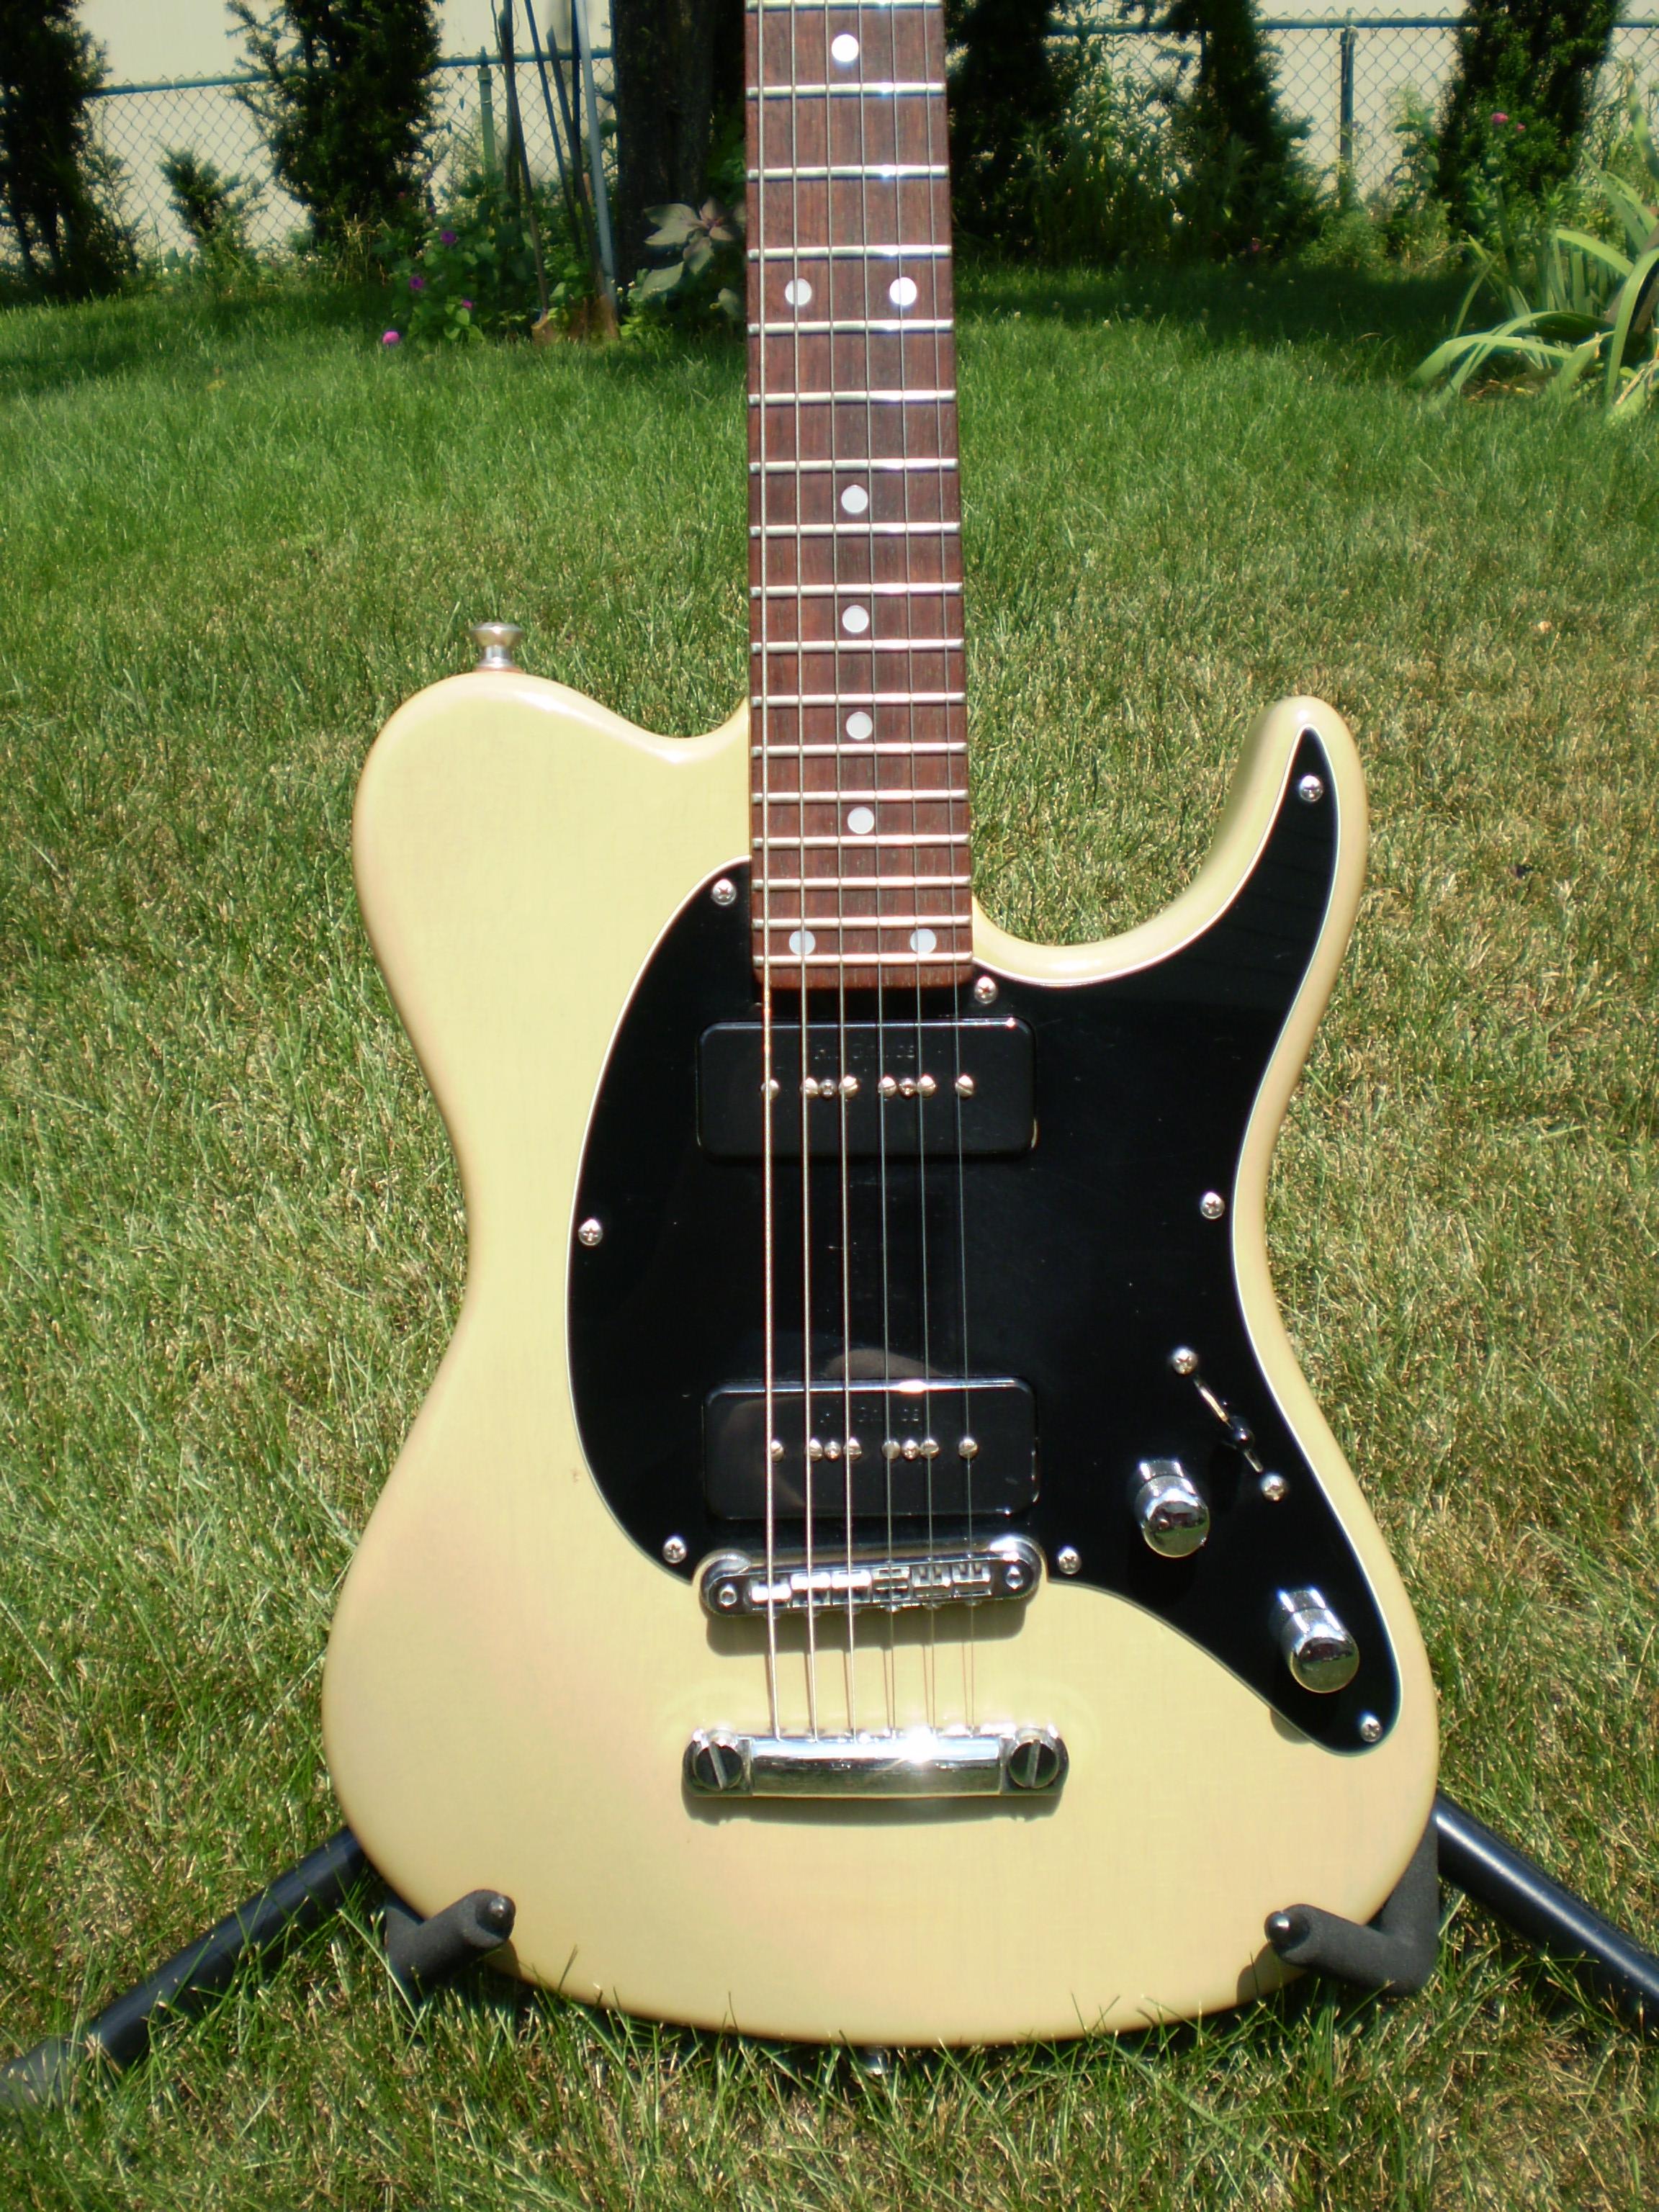 va1716 va standard pro larry carlton added 9 30 18 valley arts guitars. Black Bedroom Furniture Sets. Home Design Ideas